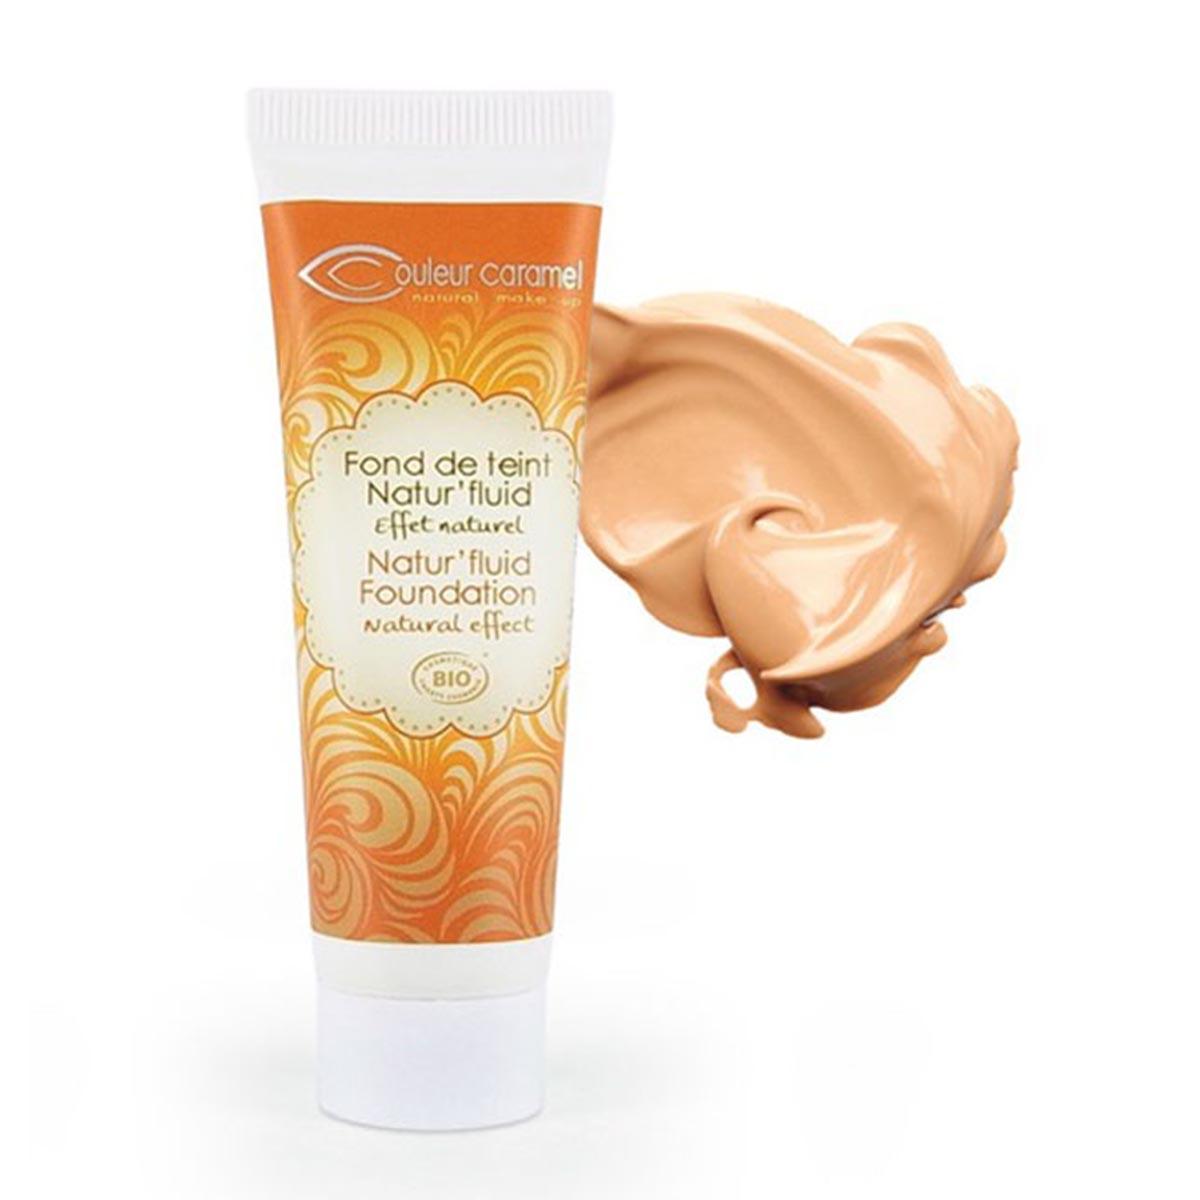 Couleur caramel fond de teint natur fluid effet naturel n 13 beige abricot